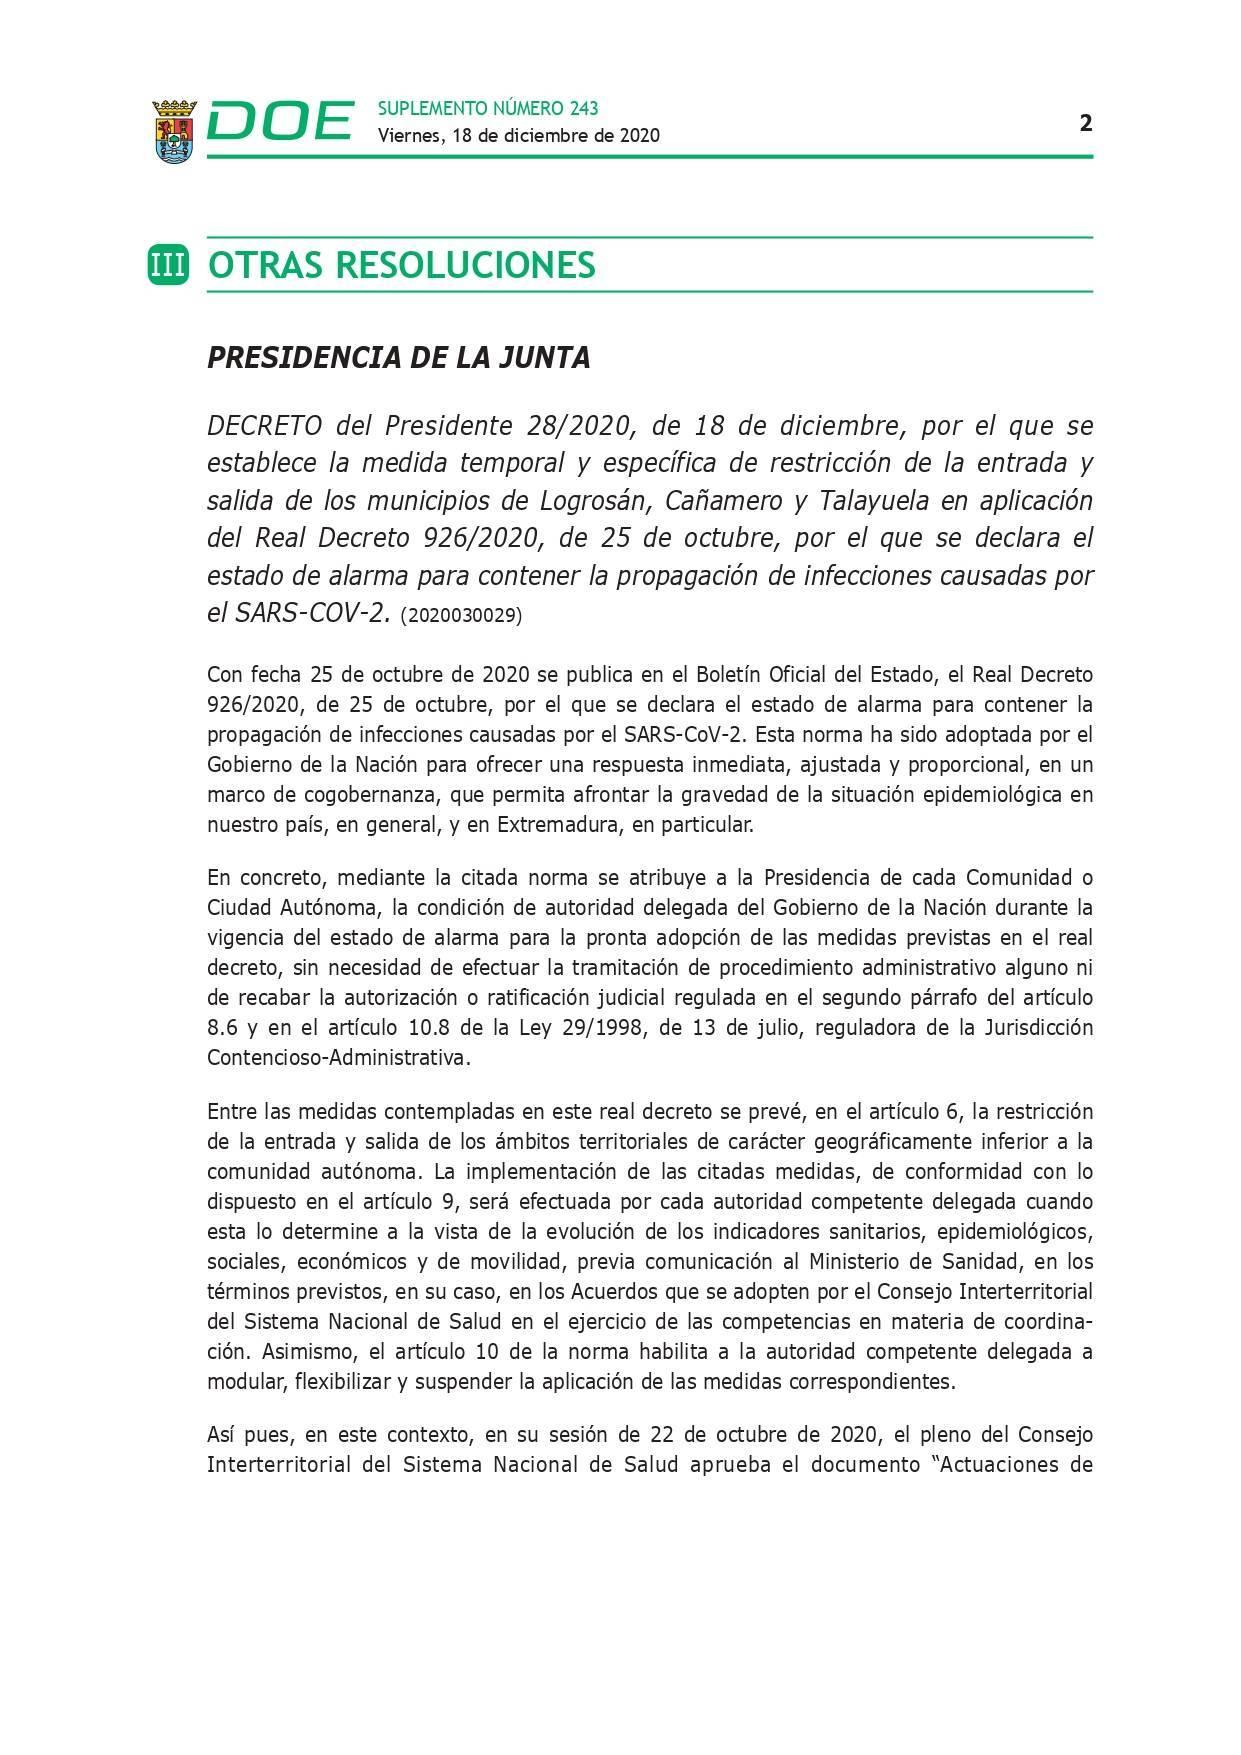 Cierre perimetral por COVID-19 (2020) - Talayuela (Cáceres), Logrosán (Cáceres) y Cañamero (Cáceres) 2